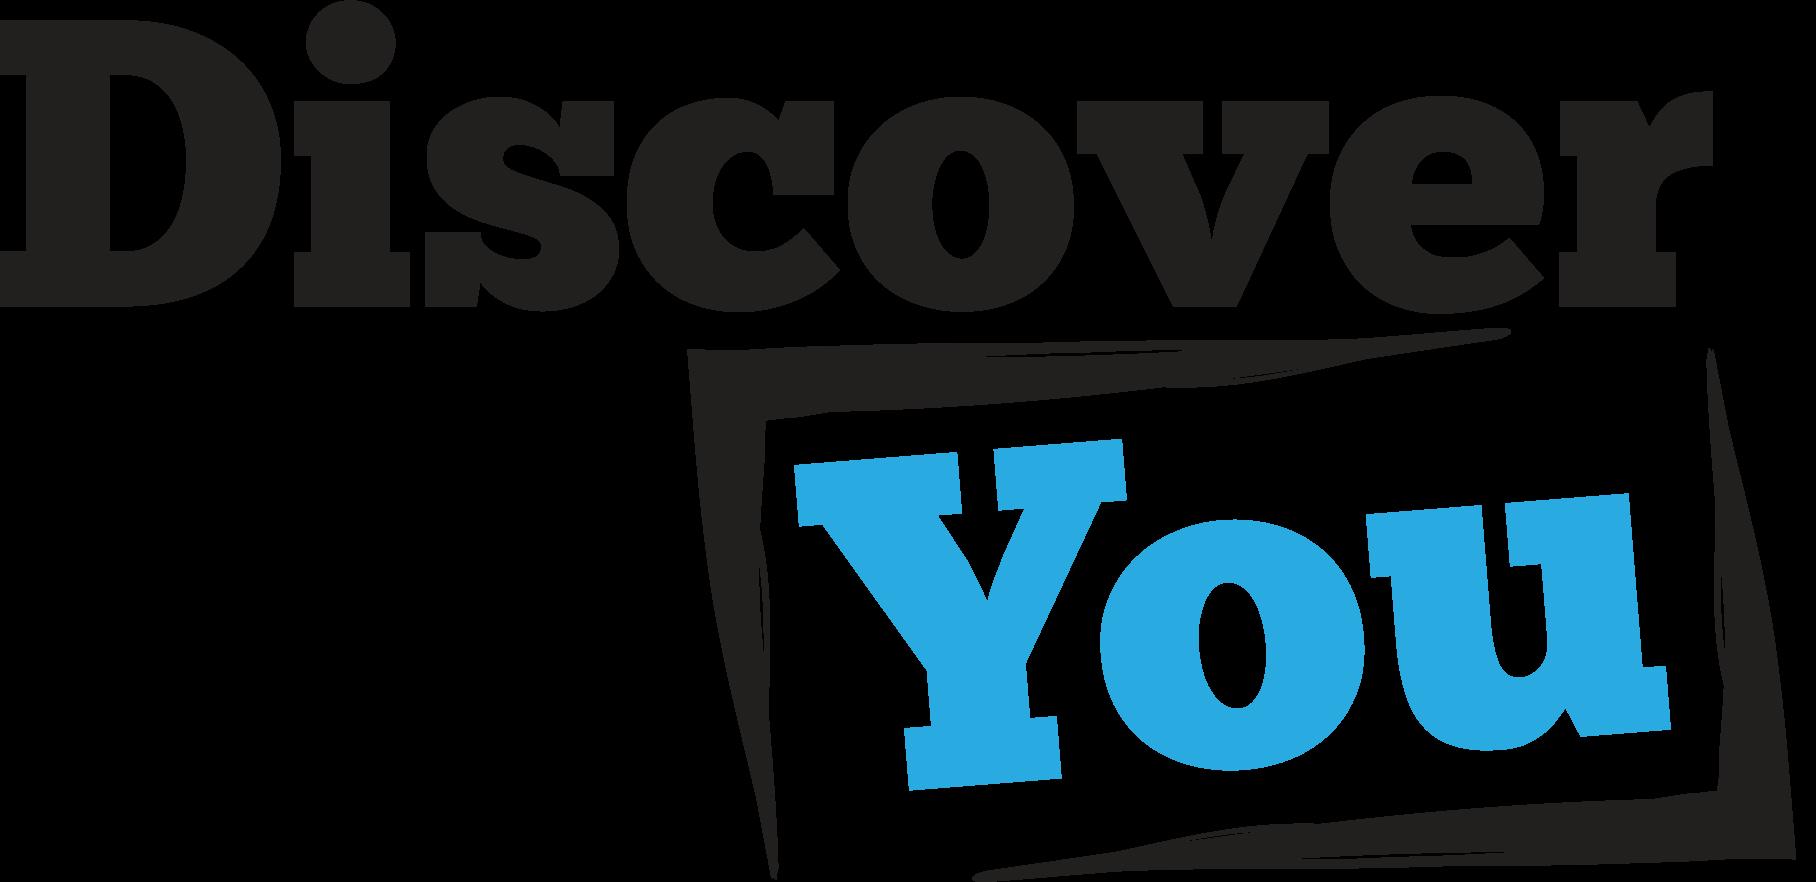 The ROCK Discover You Logo